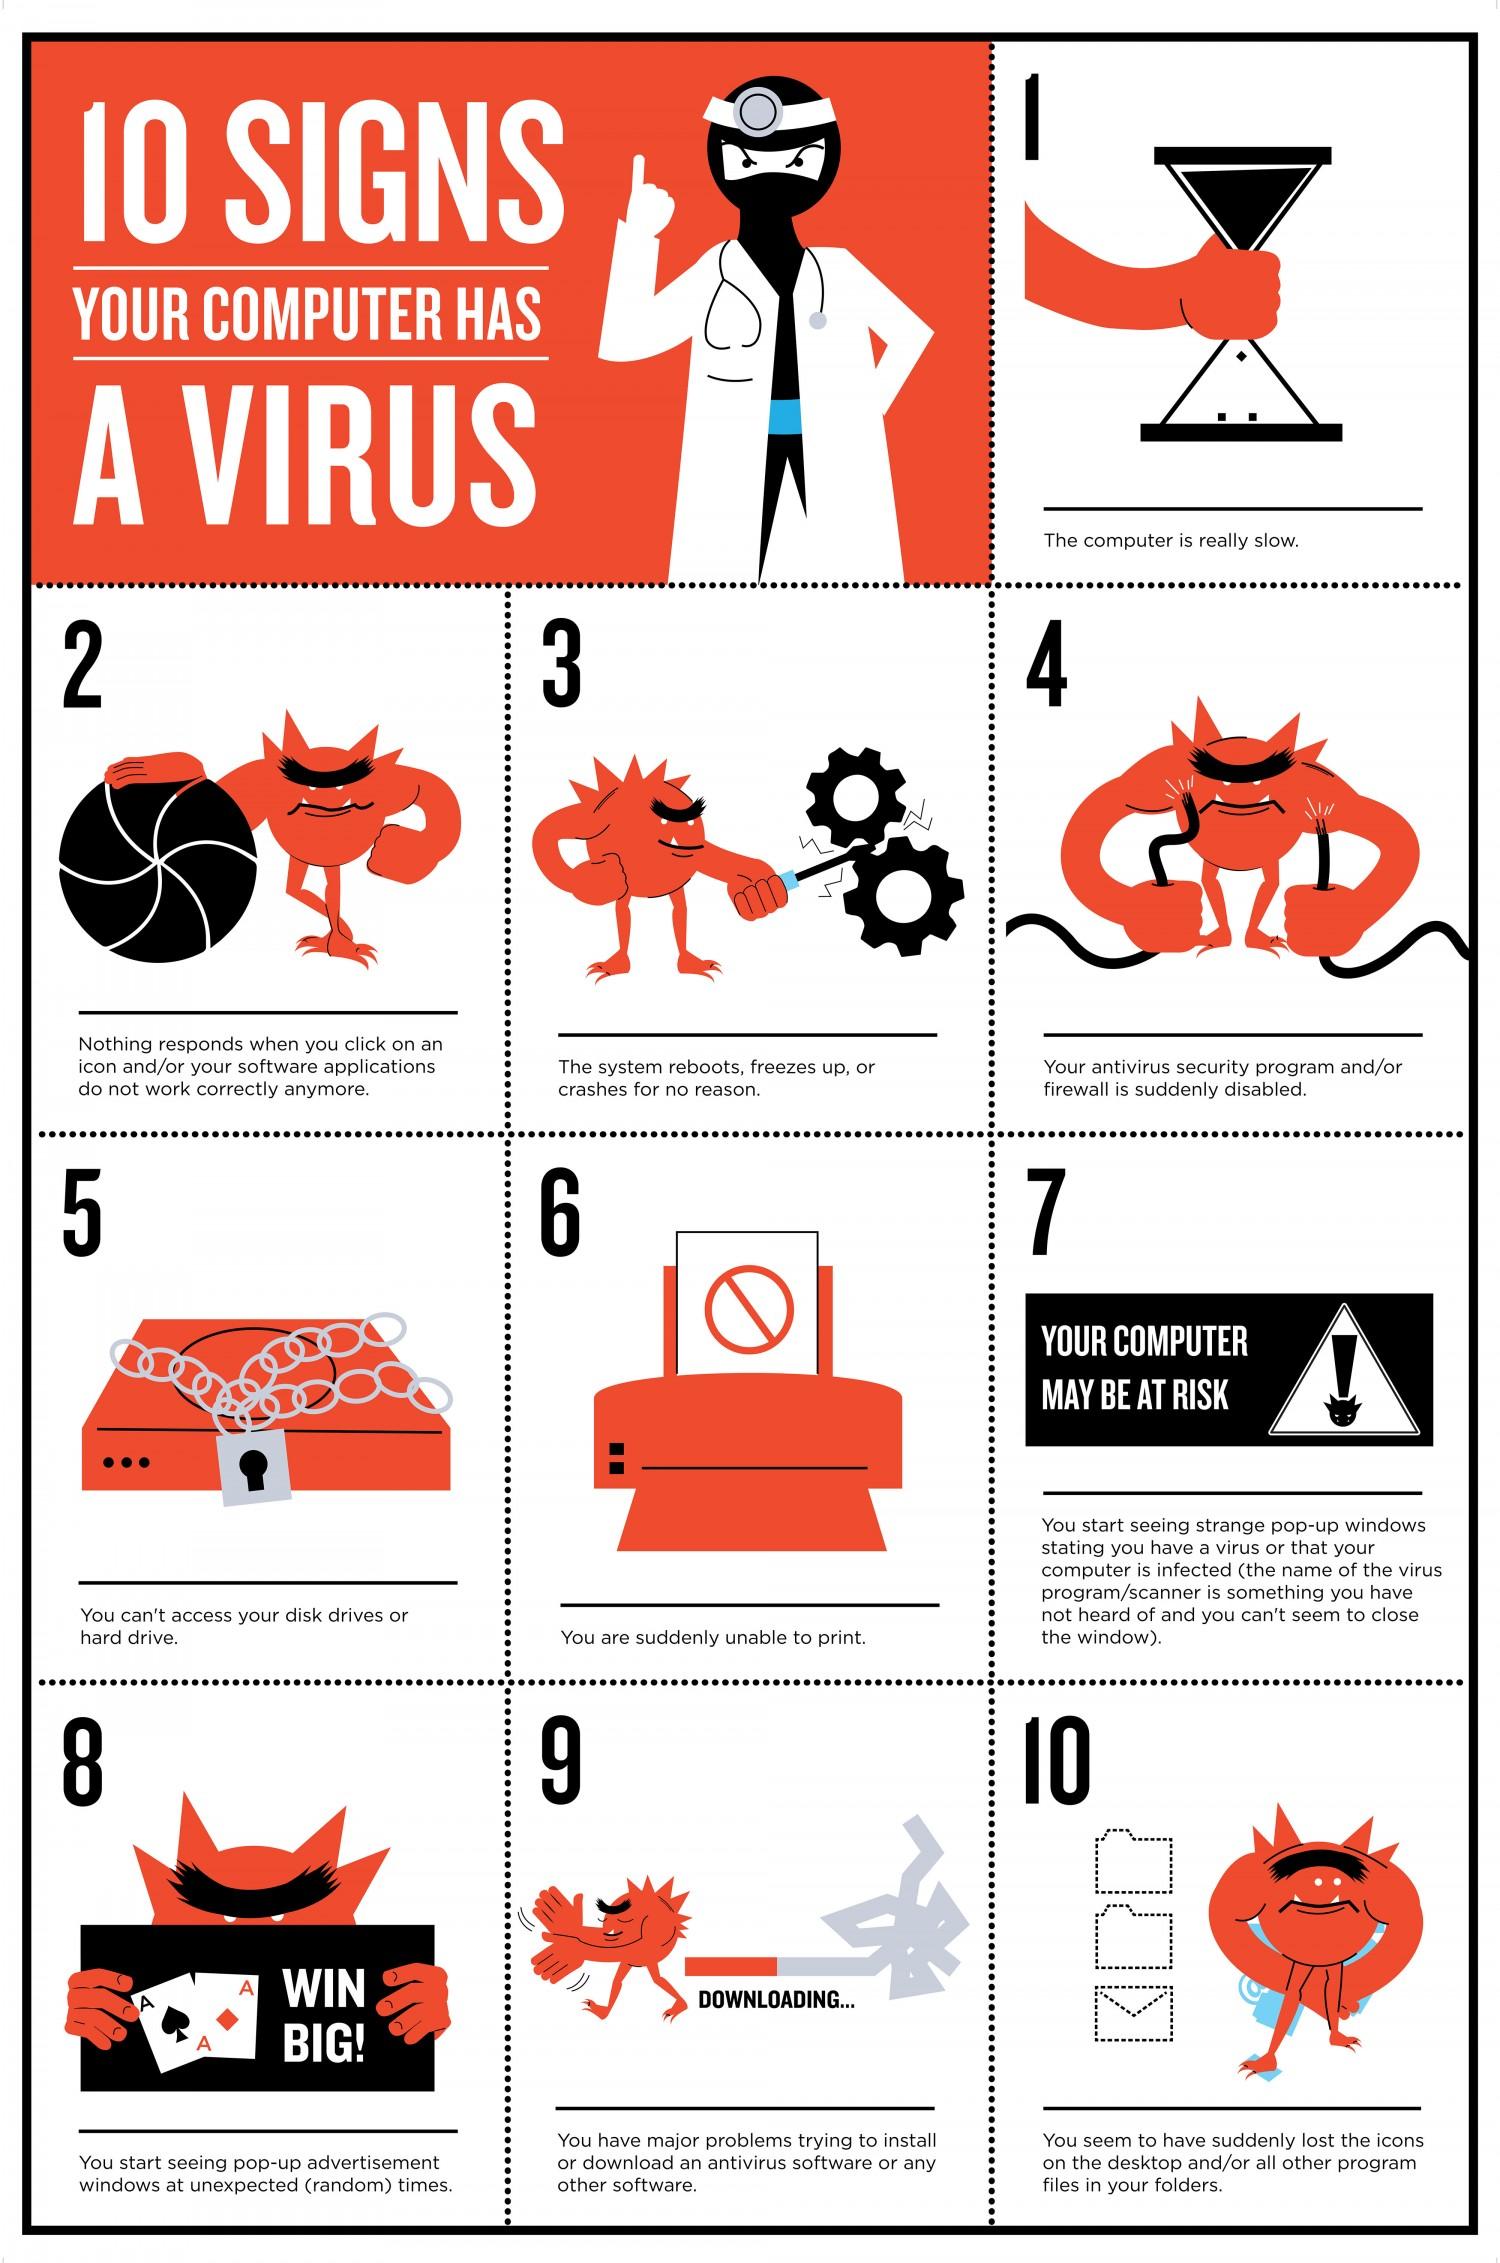 10 sinais que o seu computador está infetado